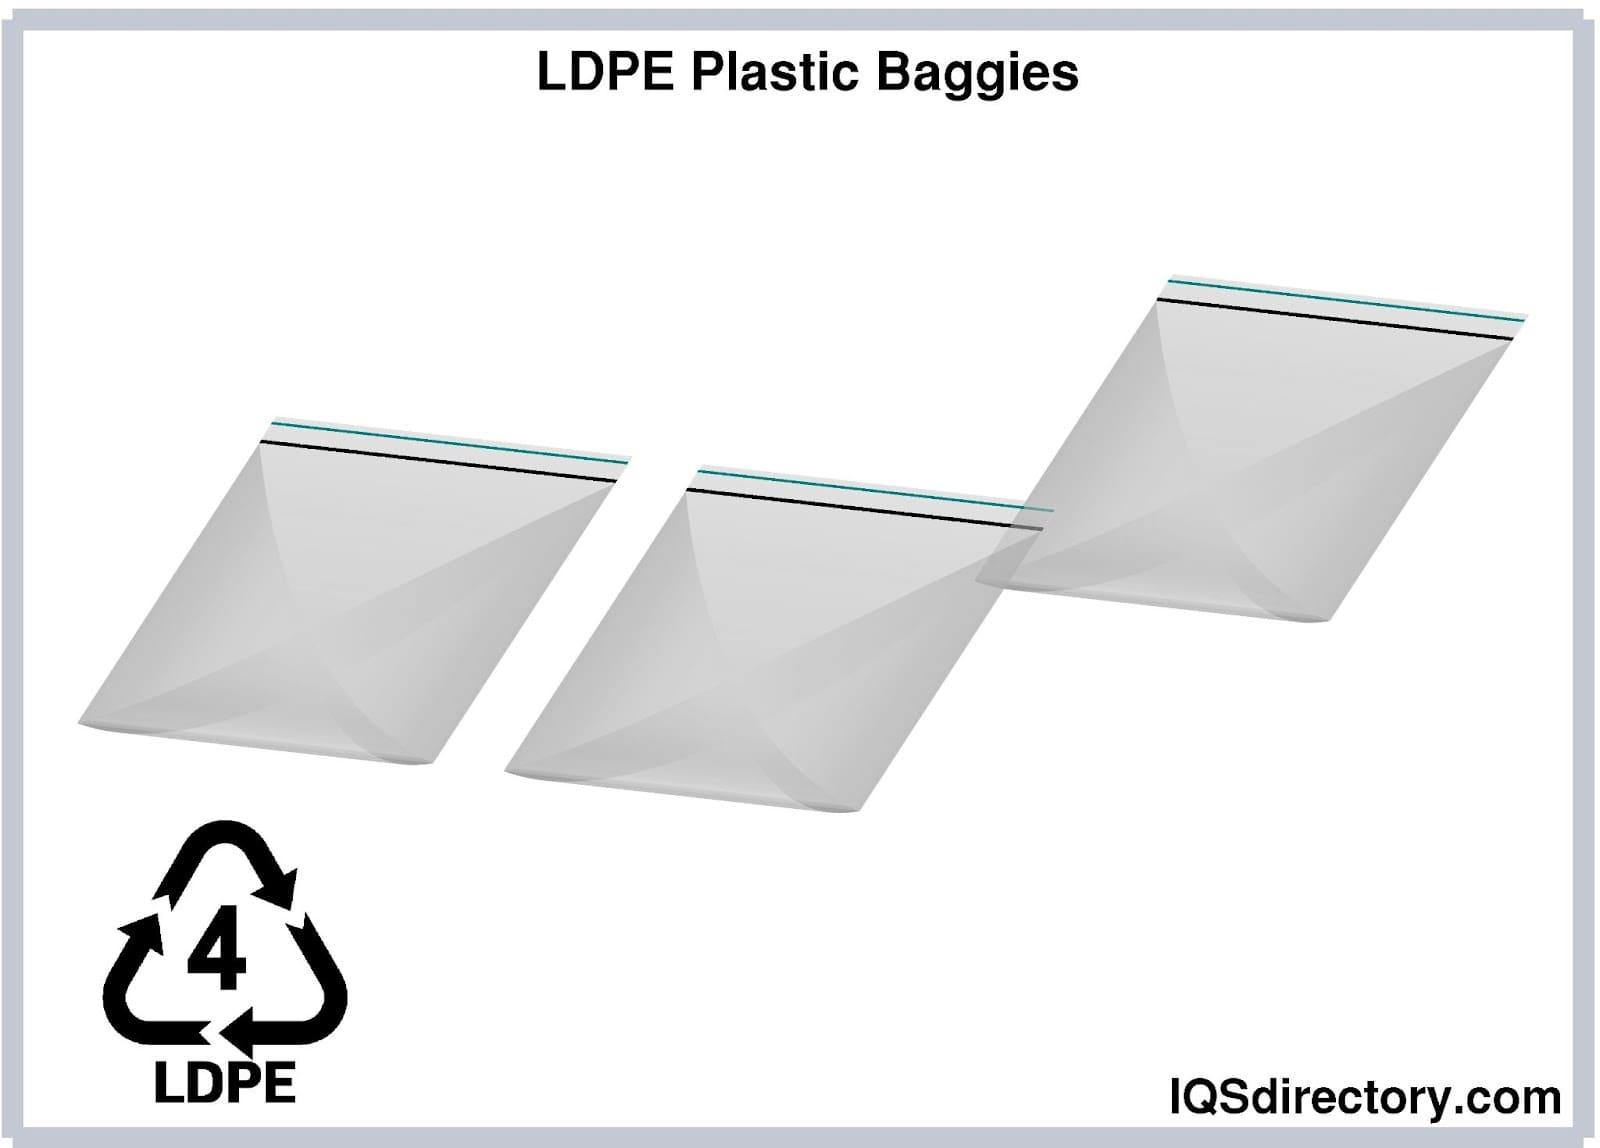 LDPE Plastic Baggies